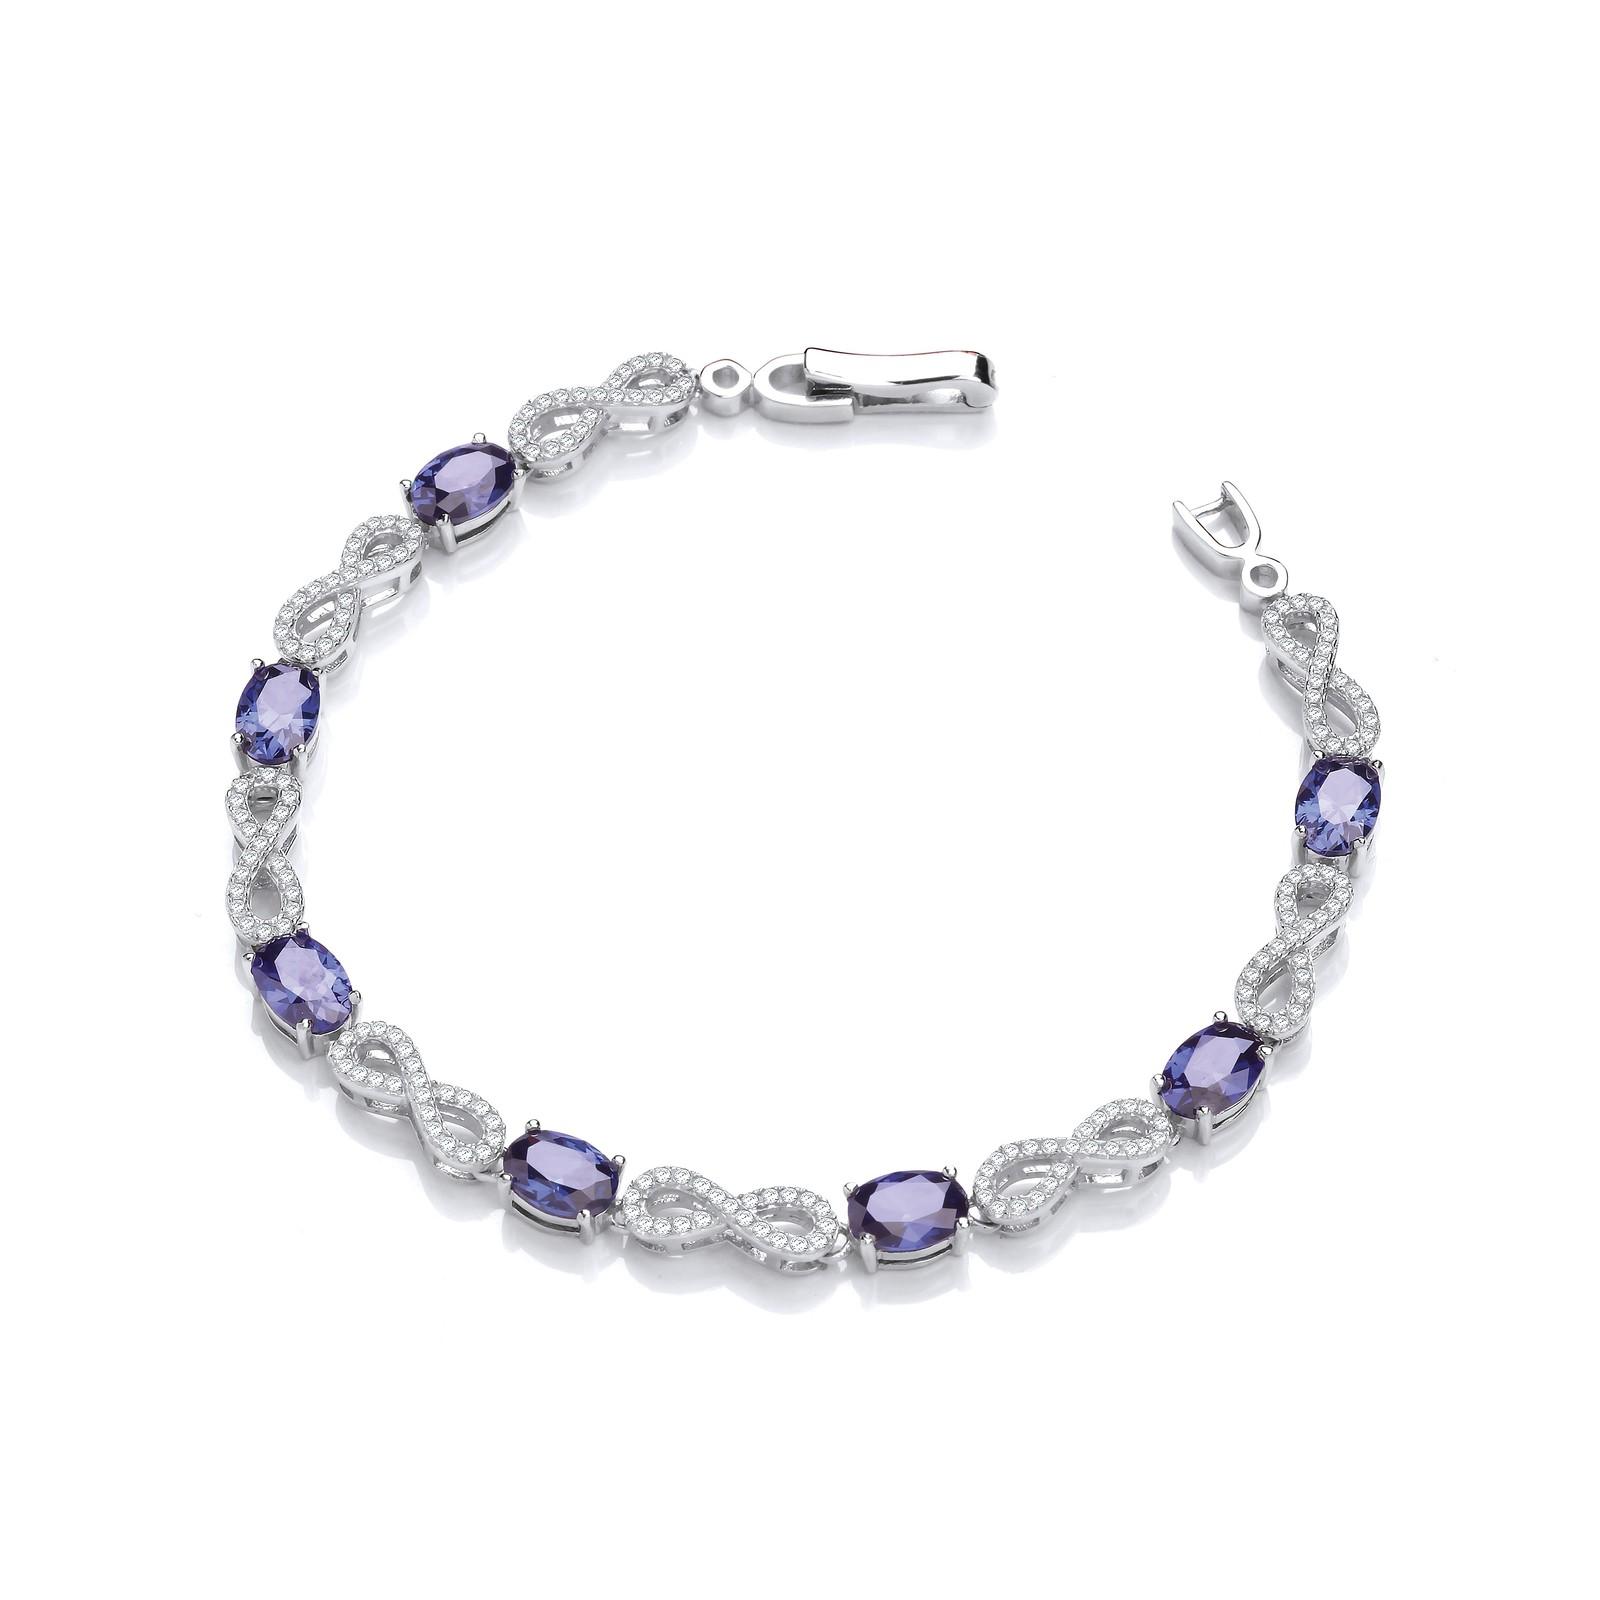 Infinity with Sapphire Blue Cz's Tennis Silver Bracelet